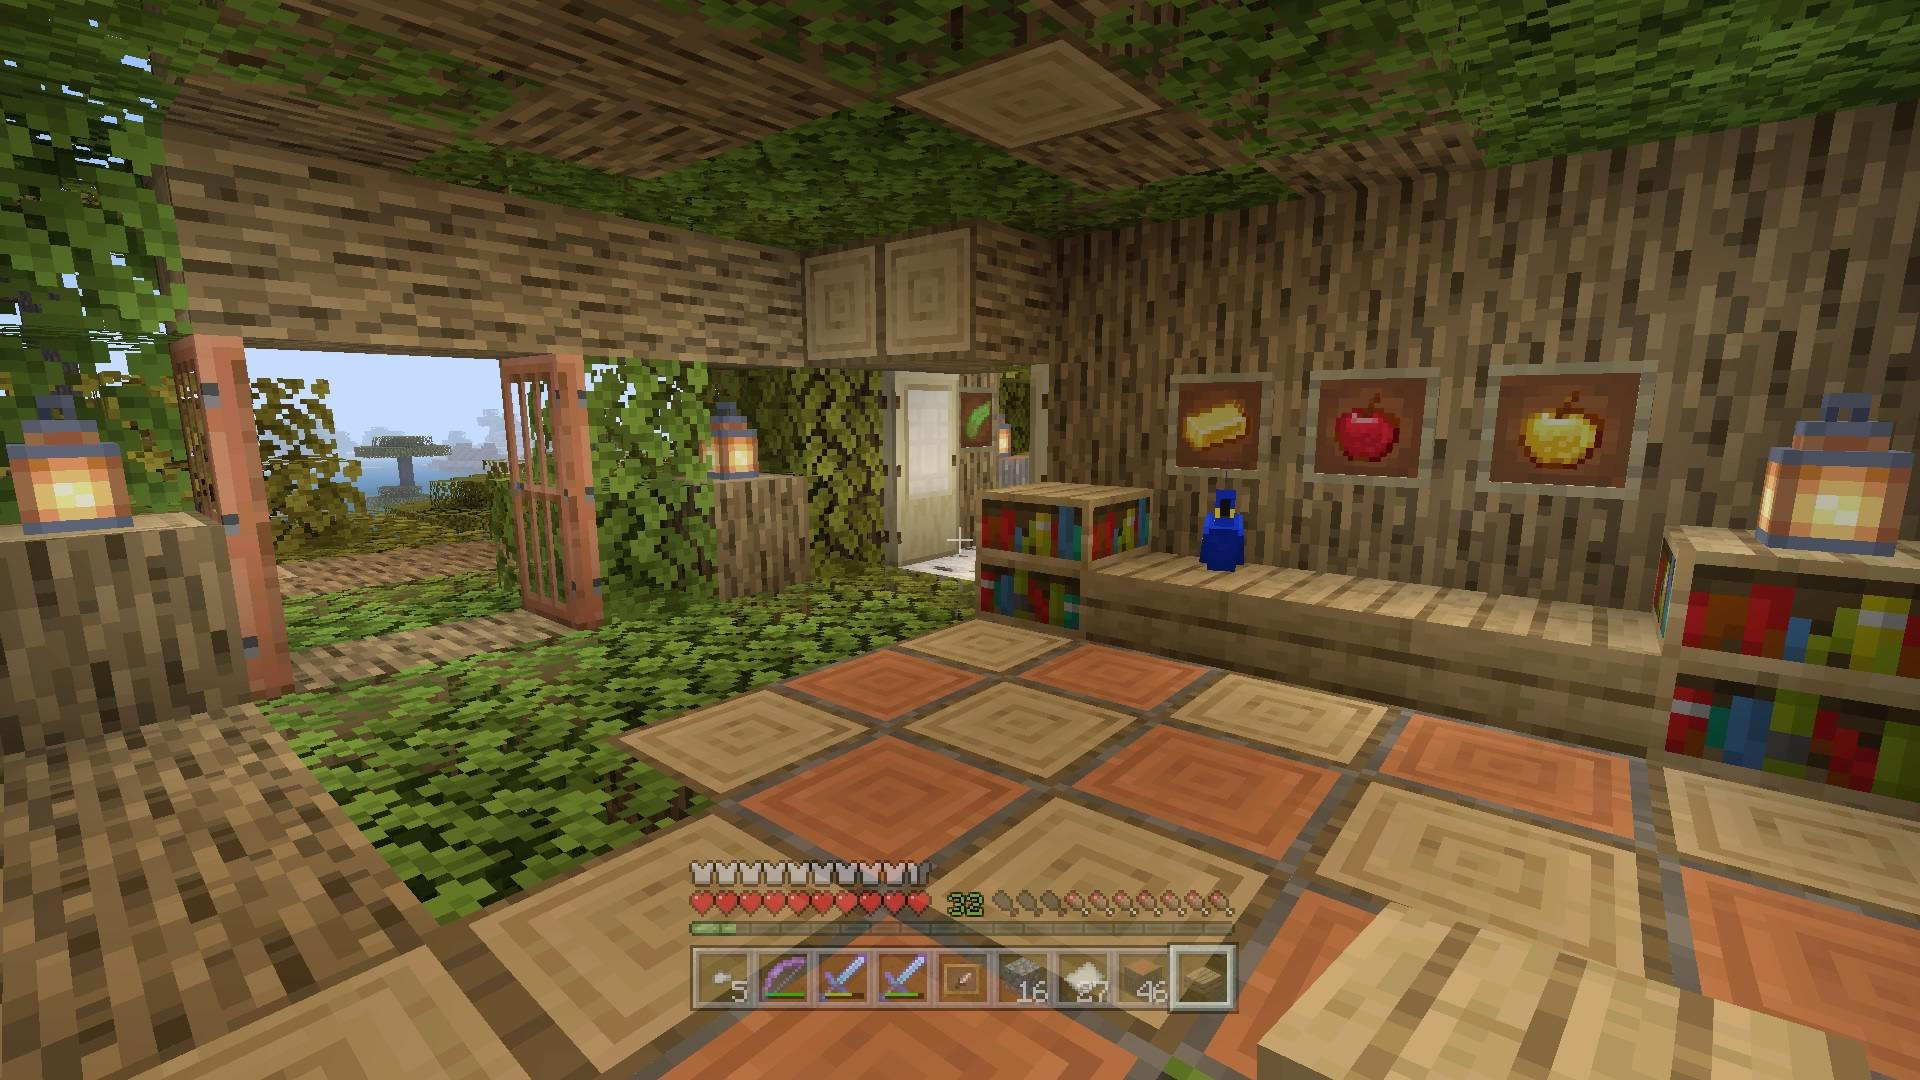 Saw A Big Tree Got An Idea Tree House Minecraft